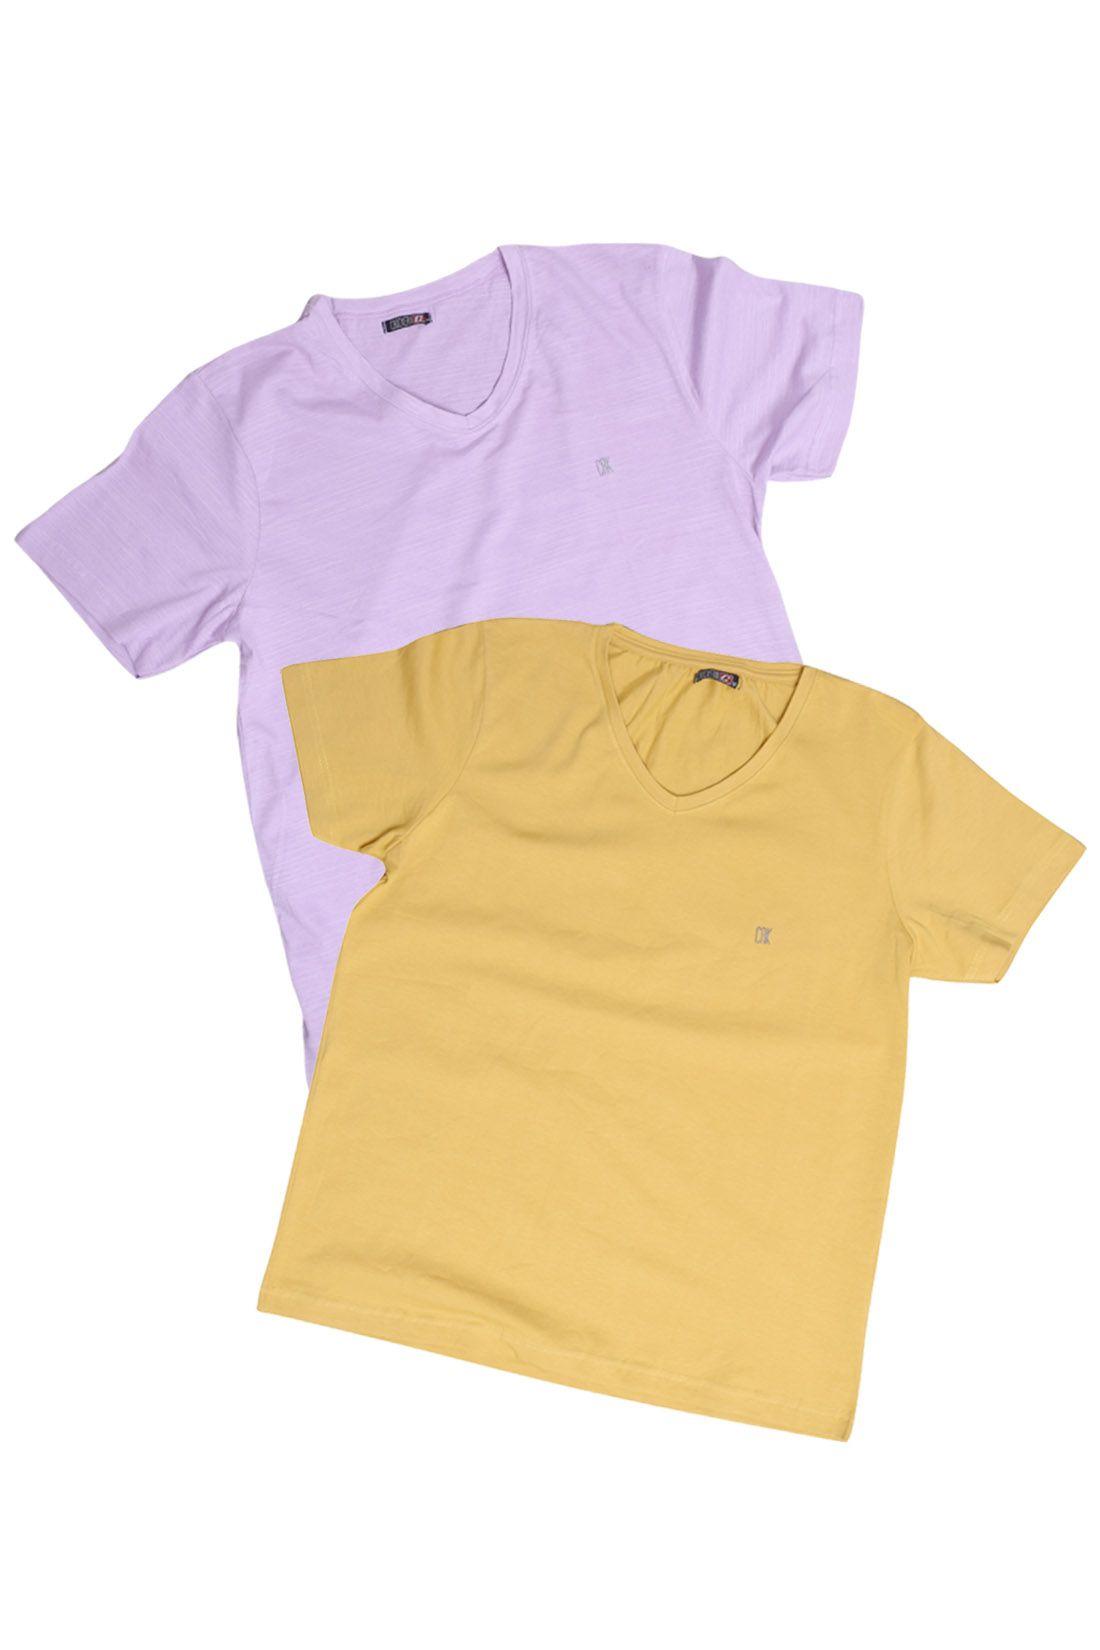 Kit 12 Camisetas Masculinas Básica Lisa Algodão